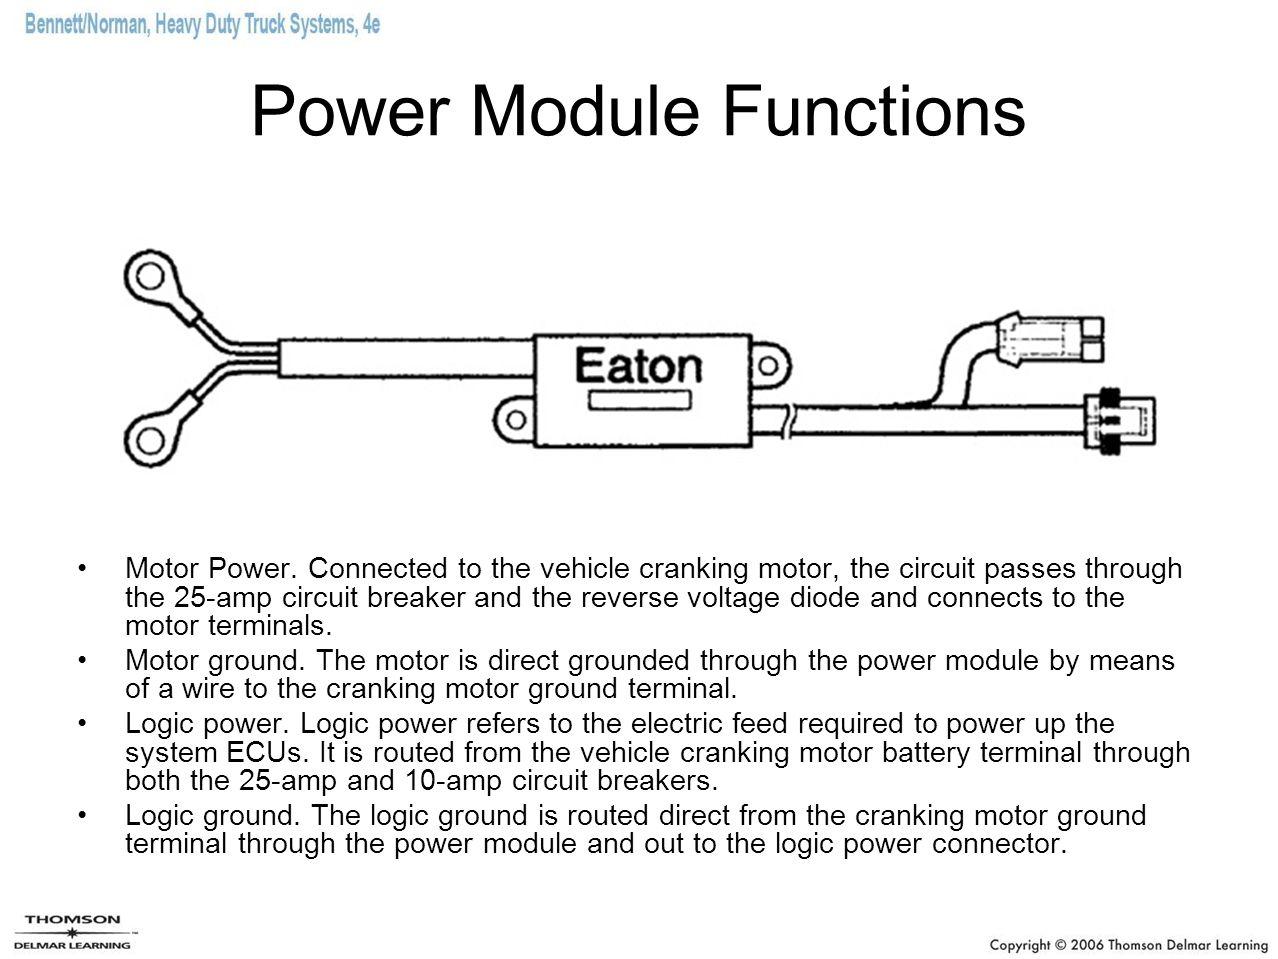 Power Module Functions